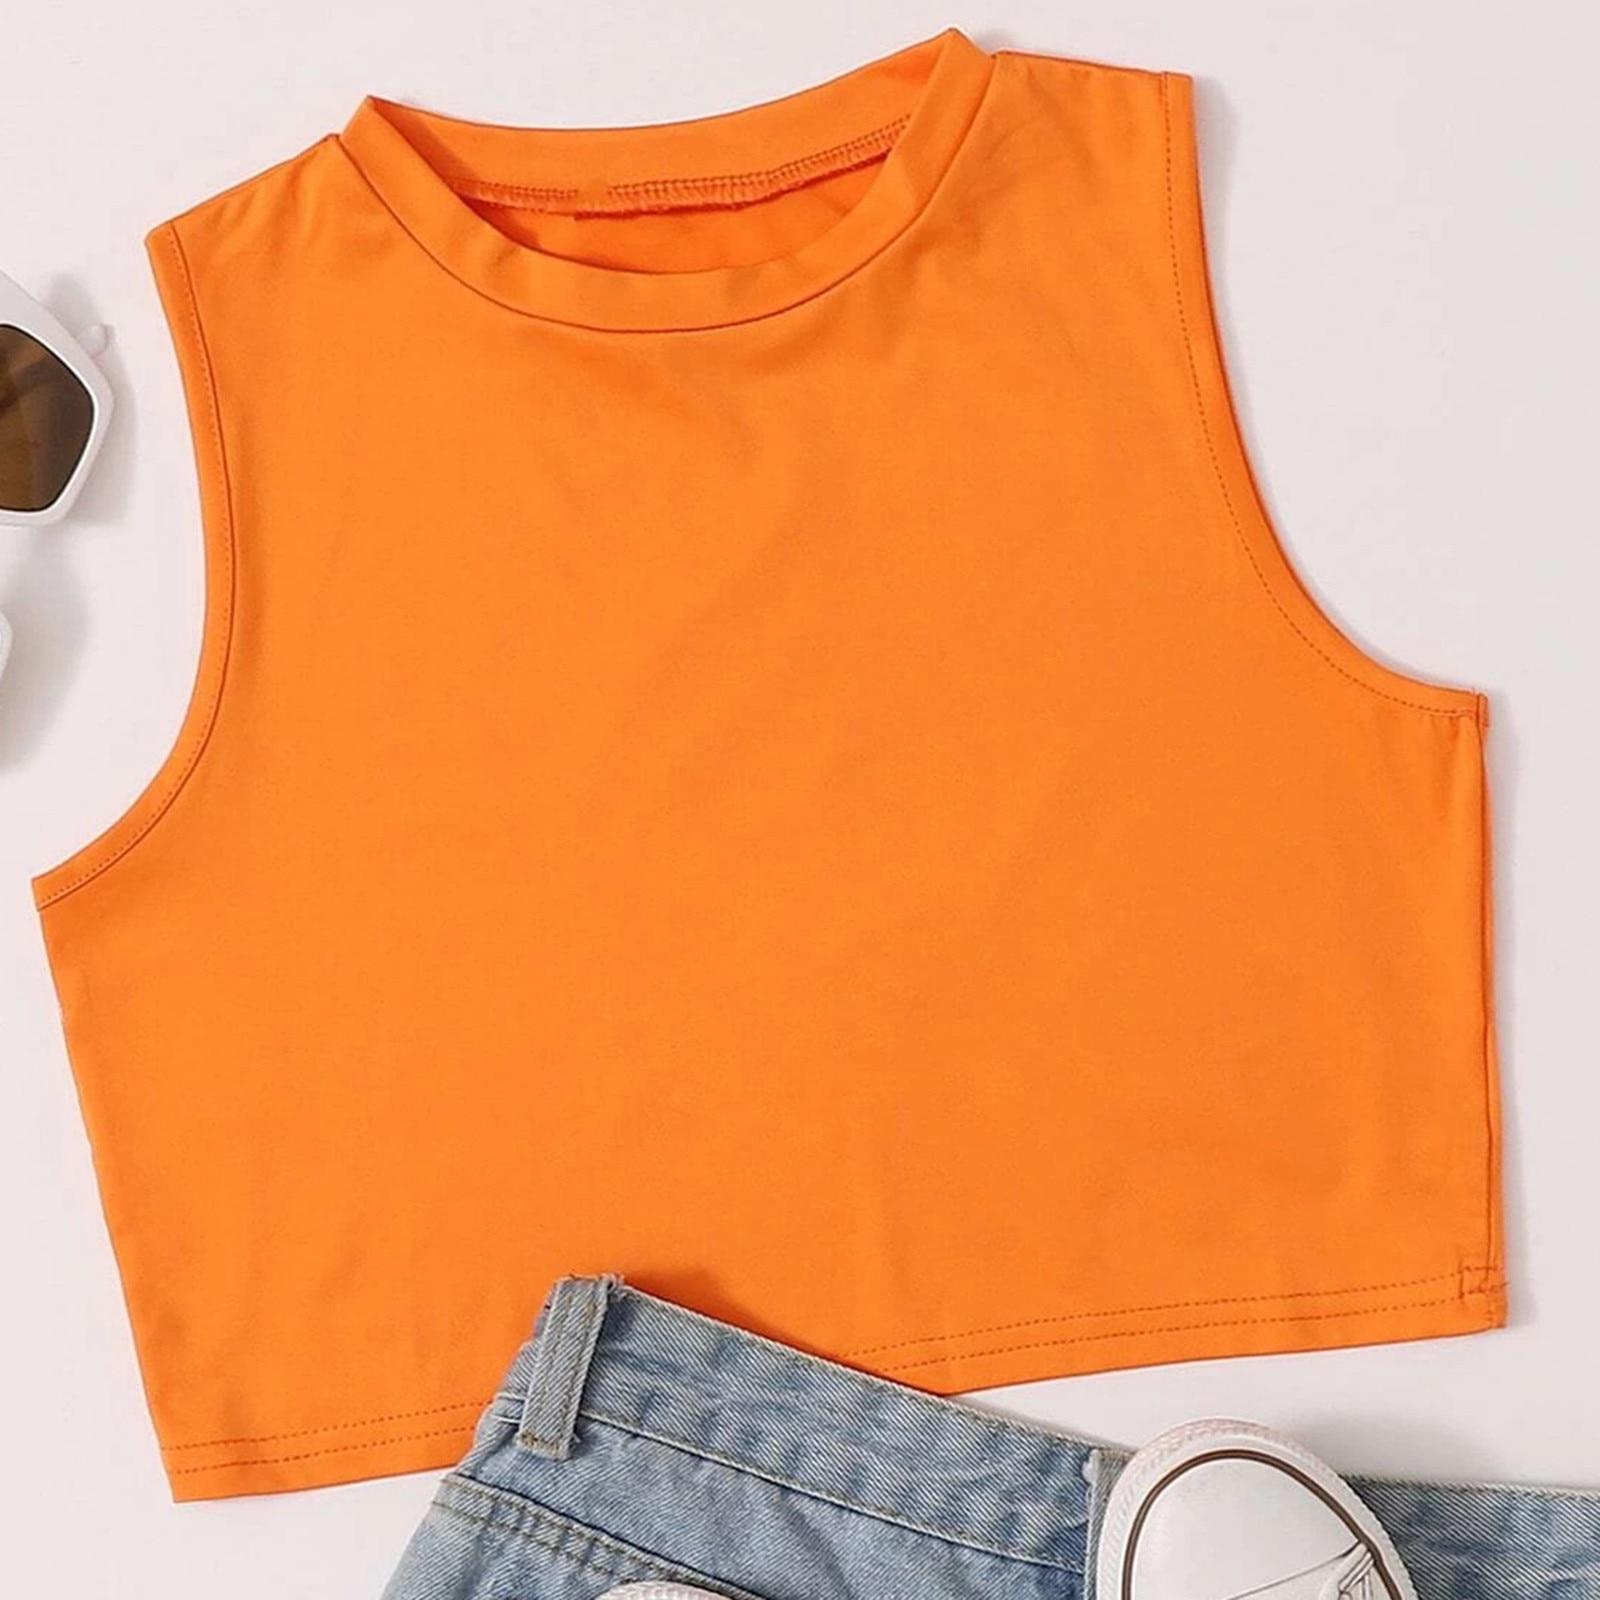 Tops de moda para mujer, camisola lisa sin mangas, naranja neón, Tops...